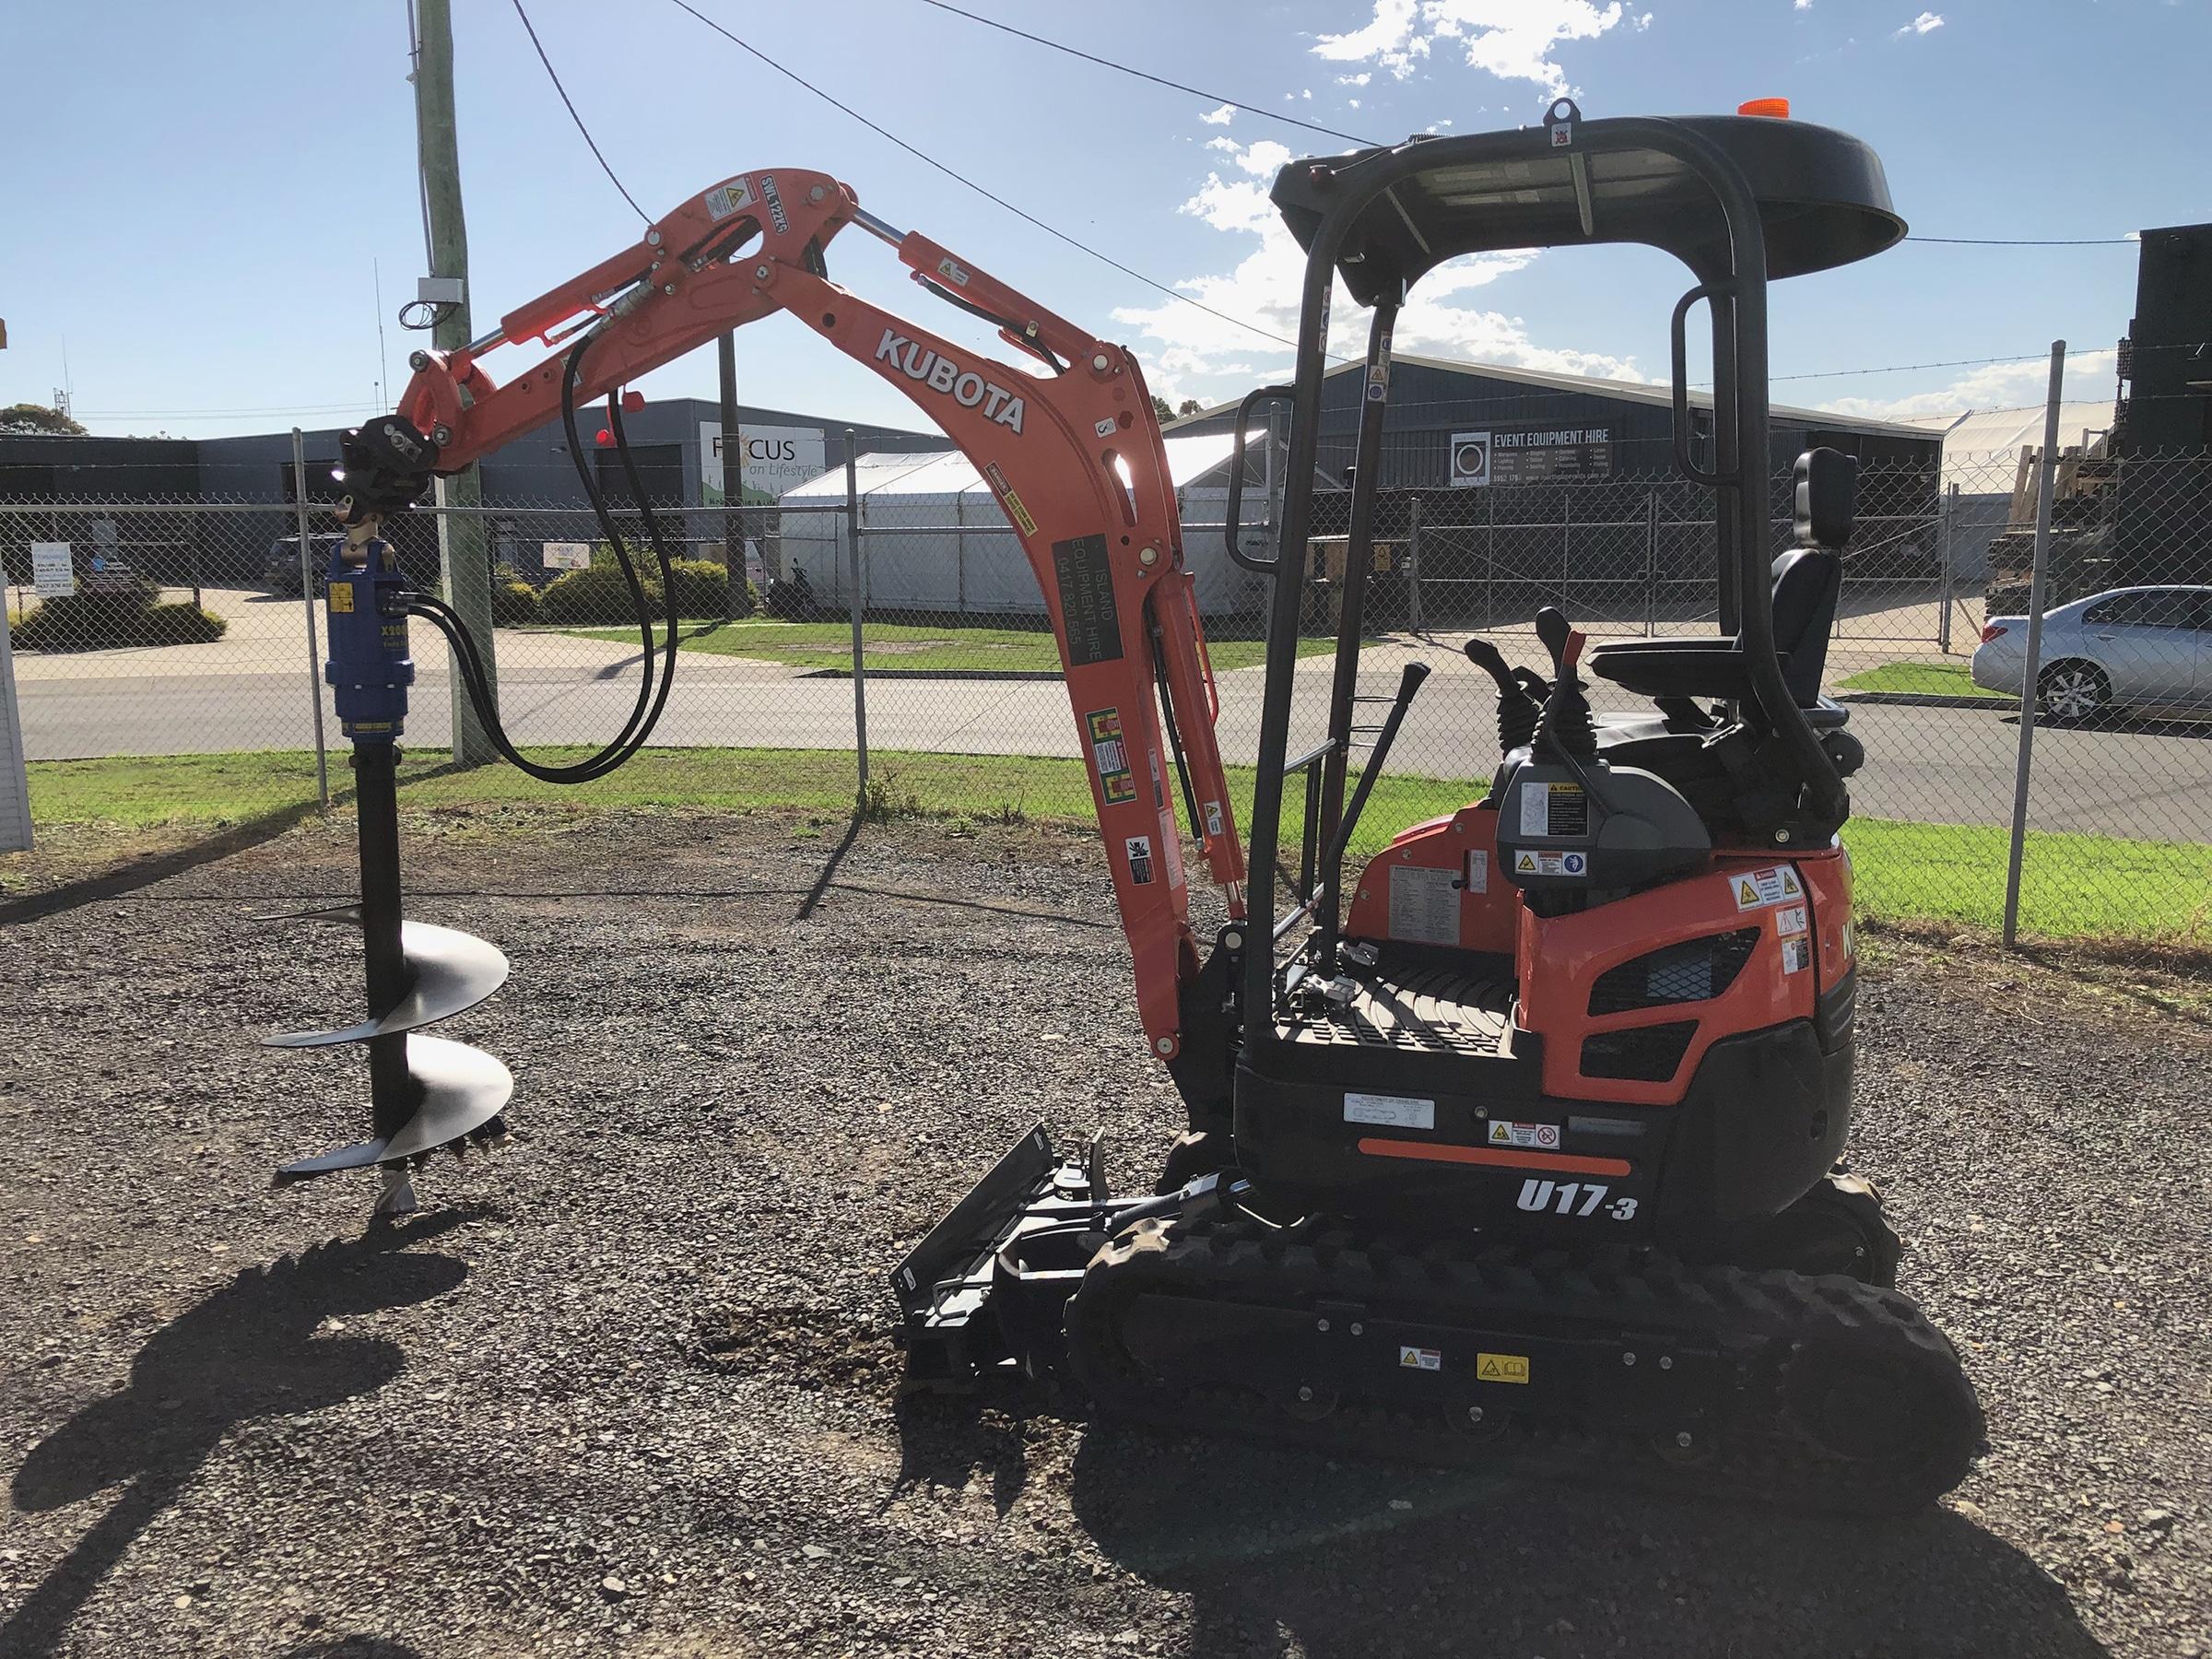 1.7 Tonne Excavator